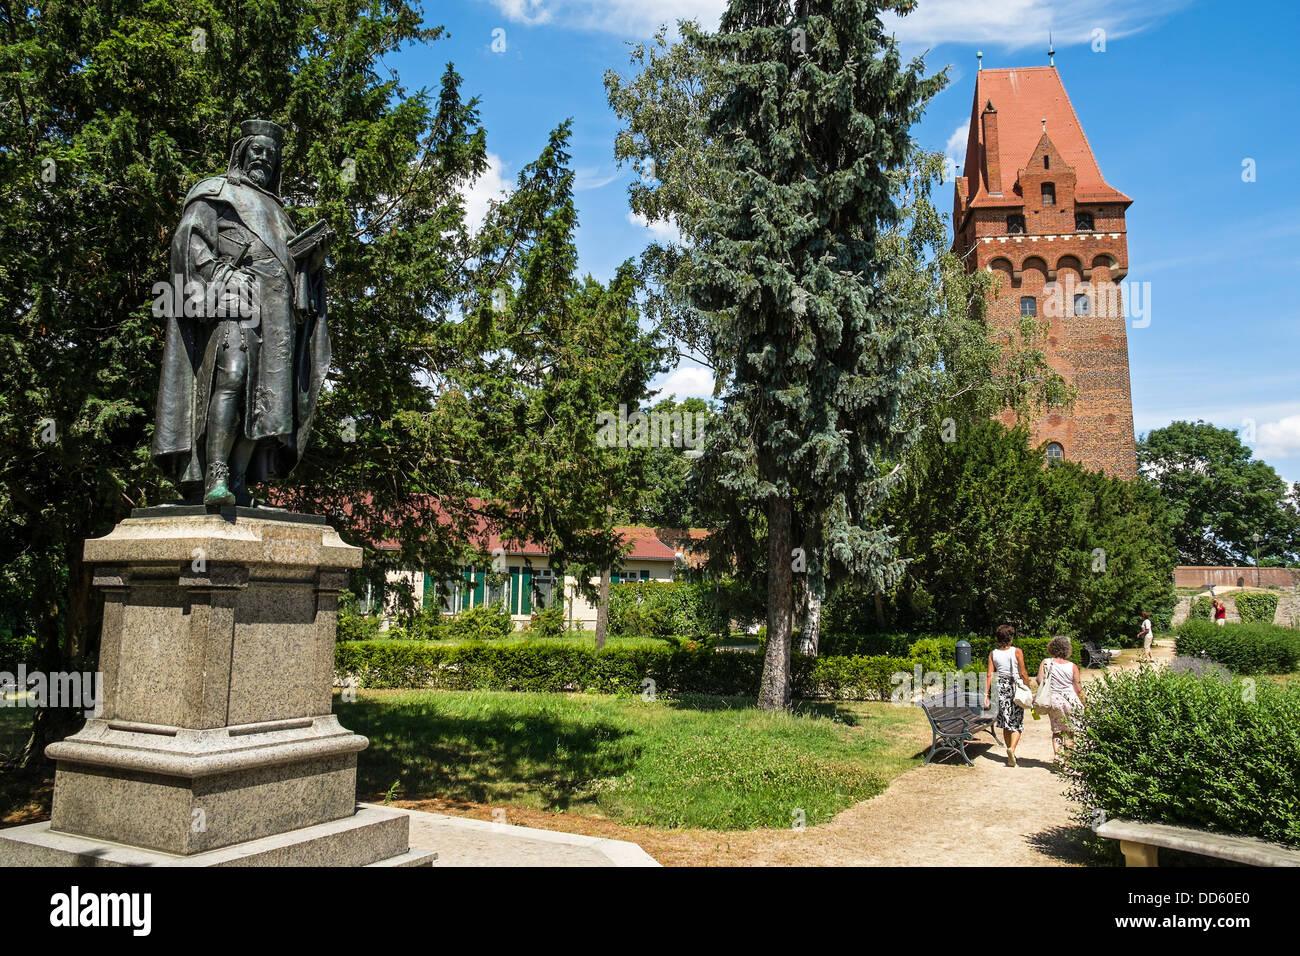 Statue Kaiser Karl IV. - Tangermünde Castle, Saxony-Anhalt, Germany Stock Photo